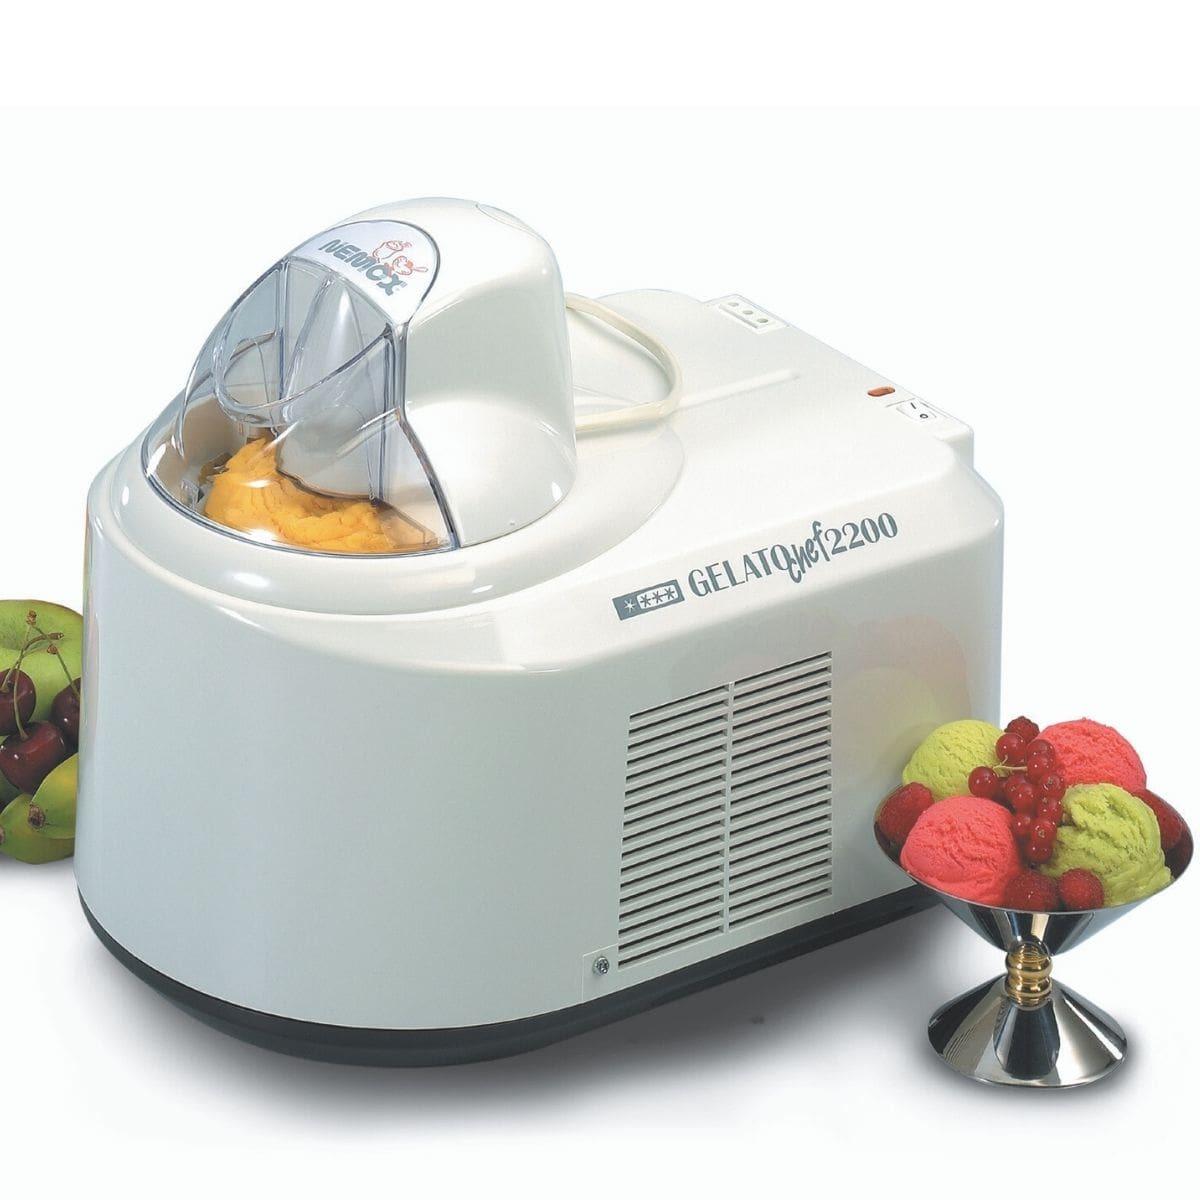 Мороженица Nemox Gelato Chef 2200 White белая 1,5 л (автоматическая)